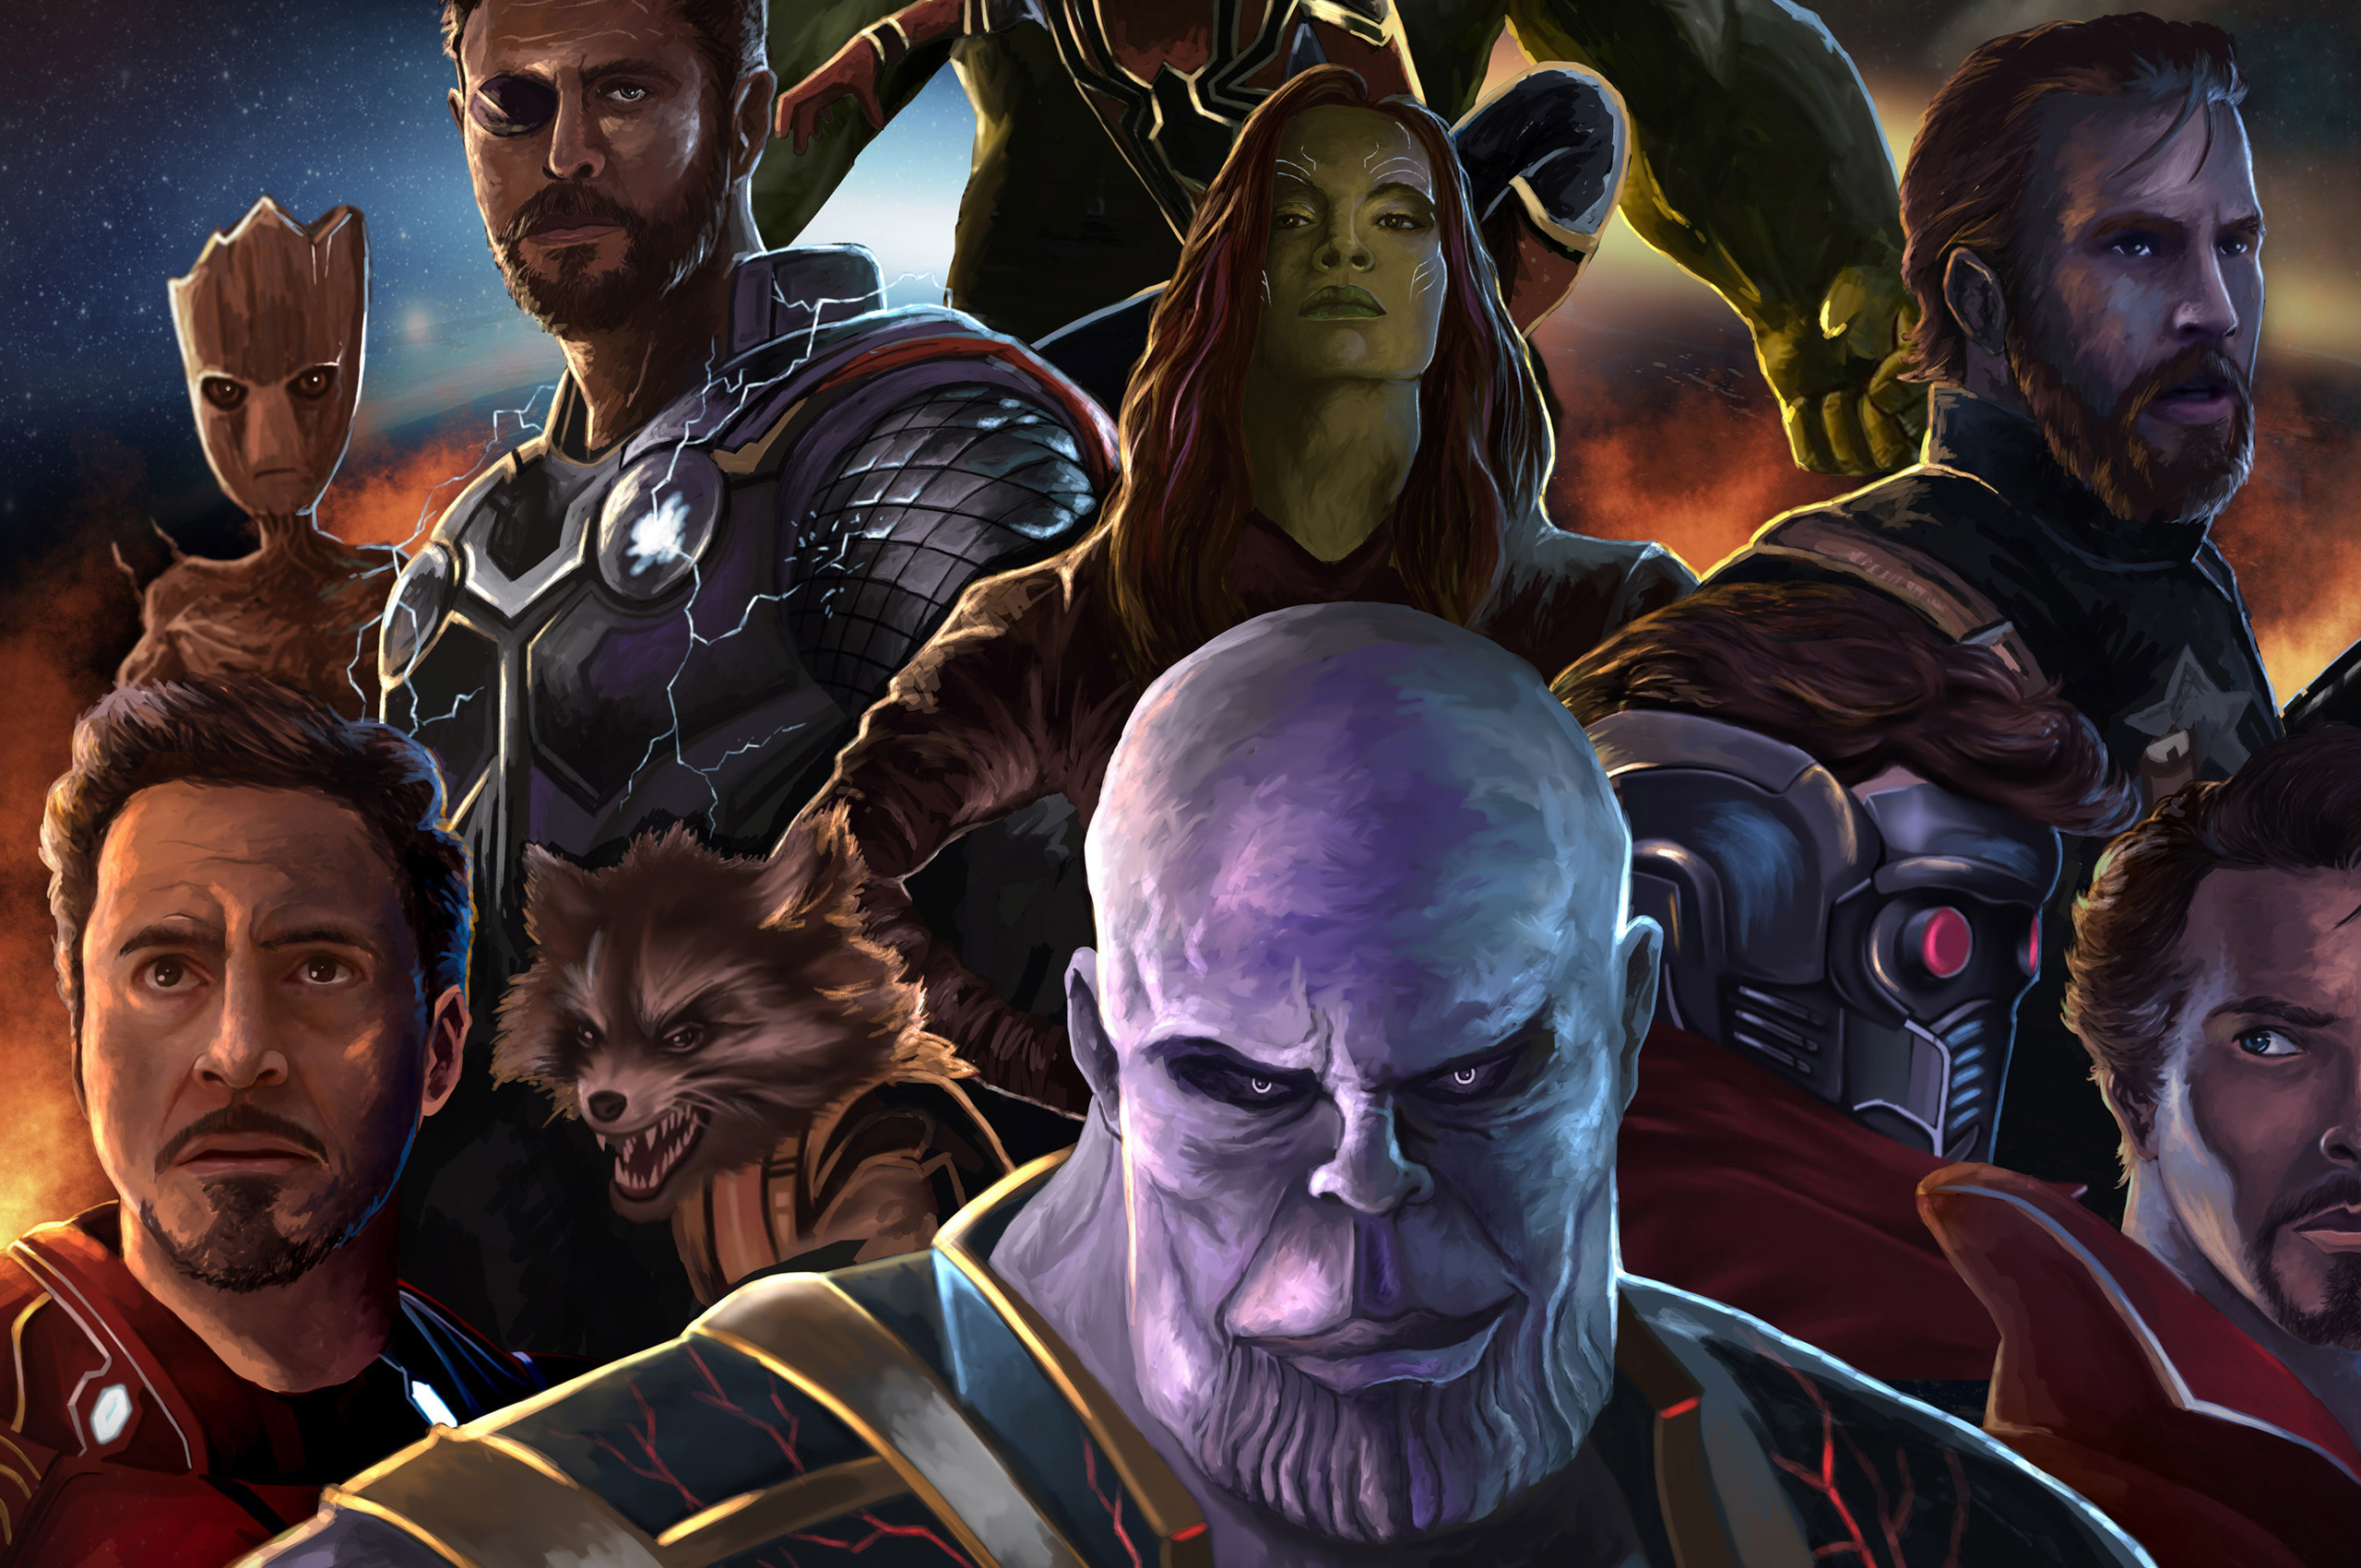 4k-avengers-infinity-war-art-ew.jpg